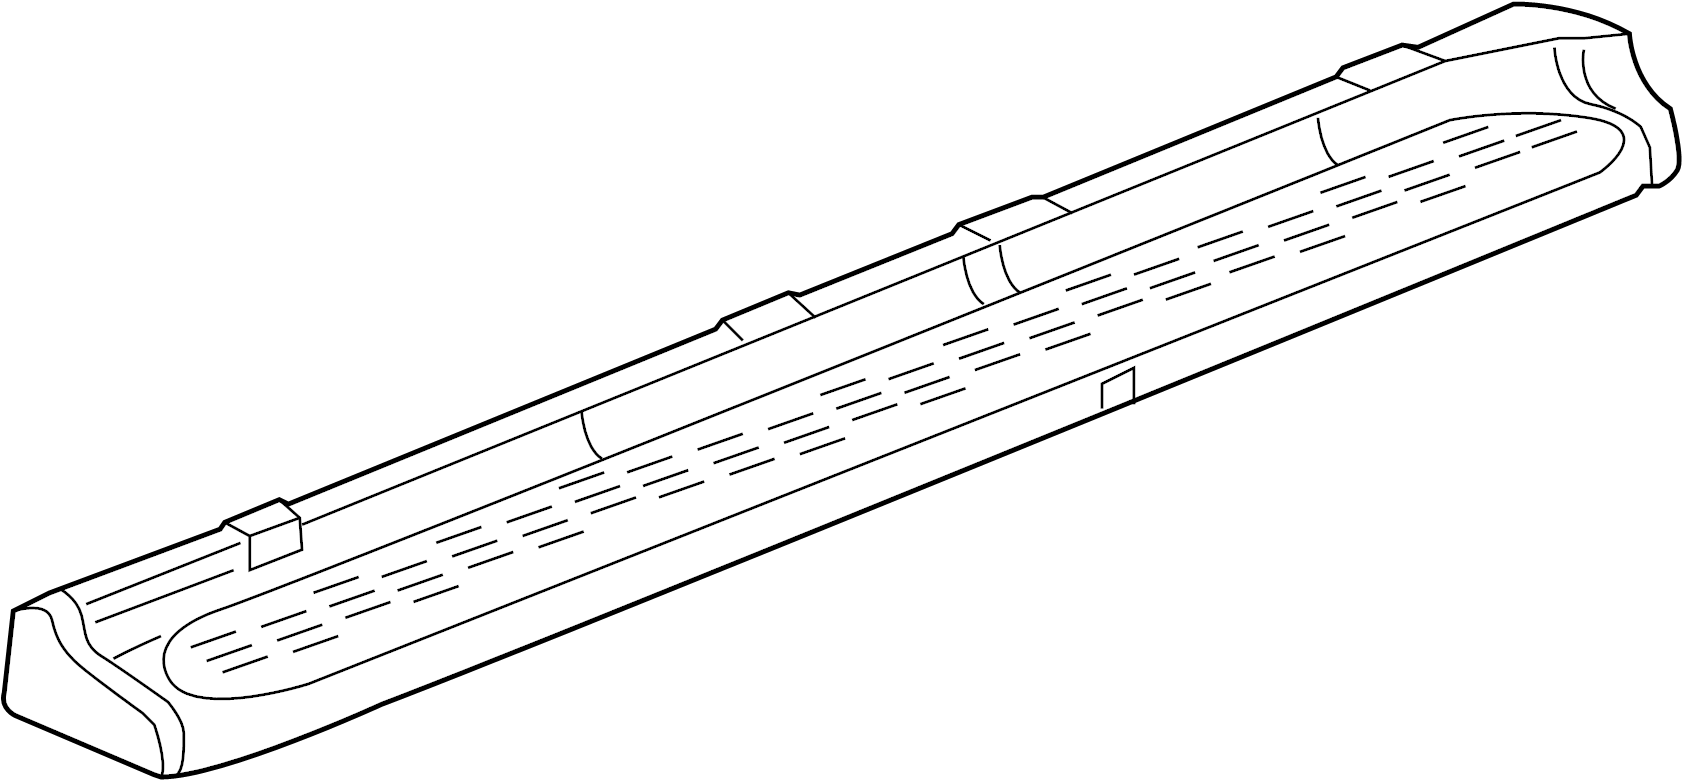 GMC Yukon XL 1500 Running Board. TYPE 1, W/DENALI, 2005-06